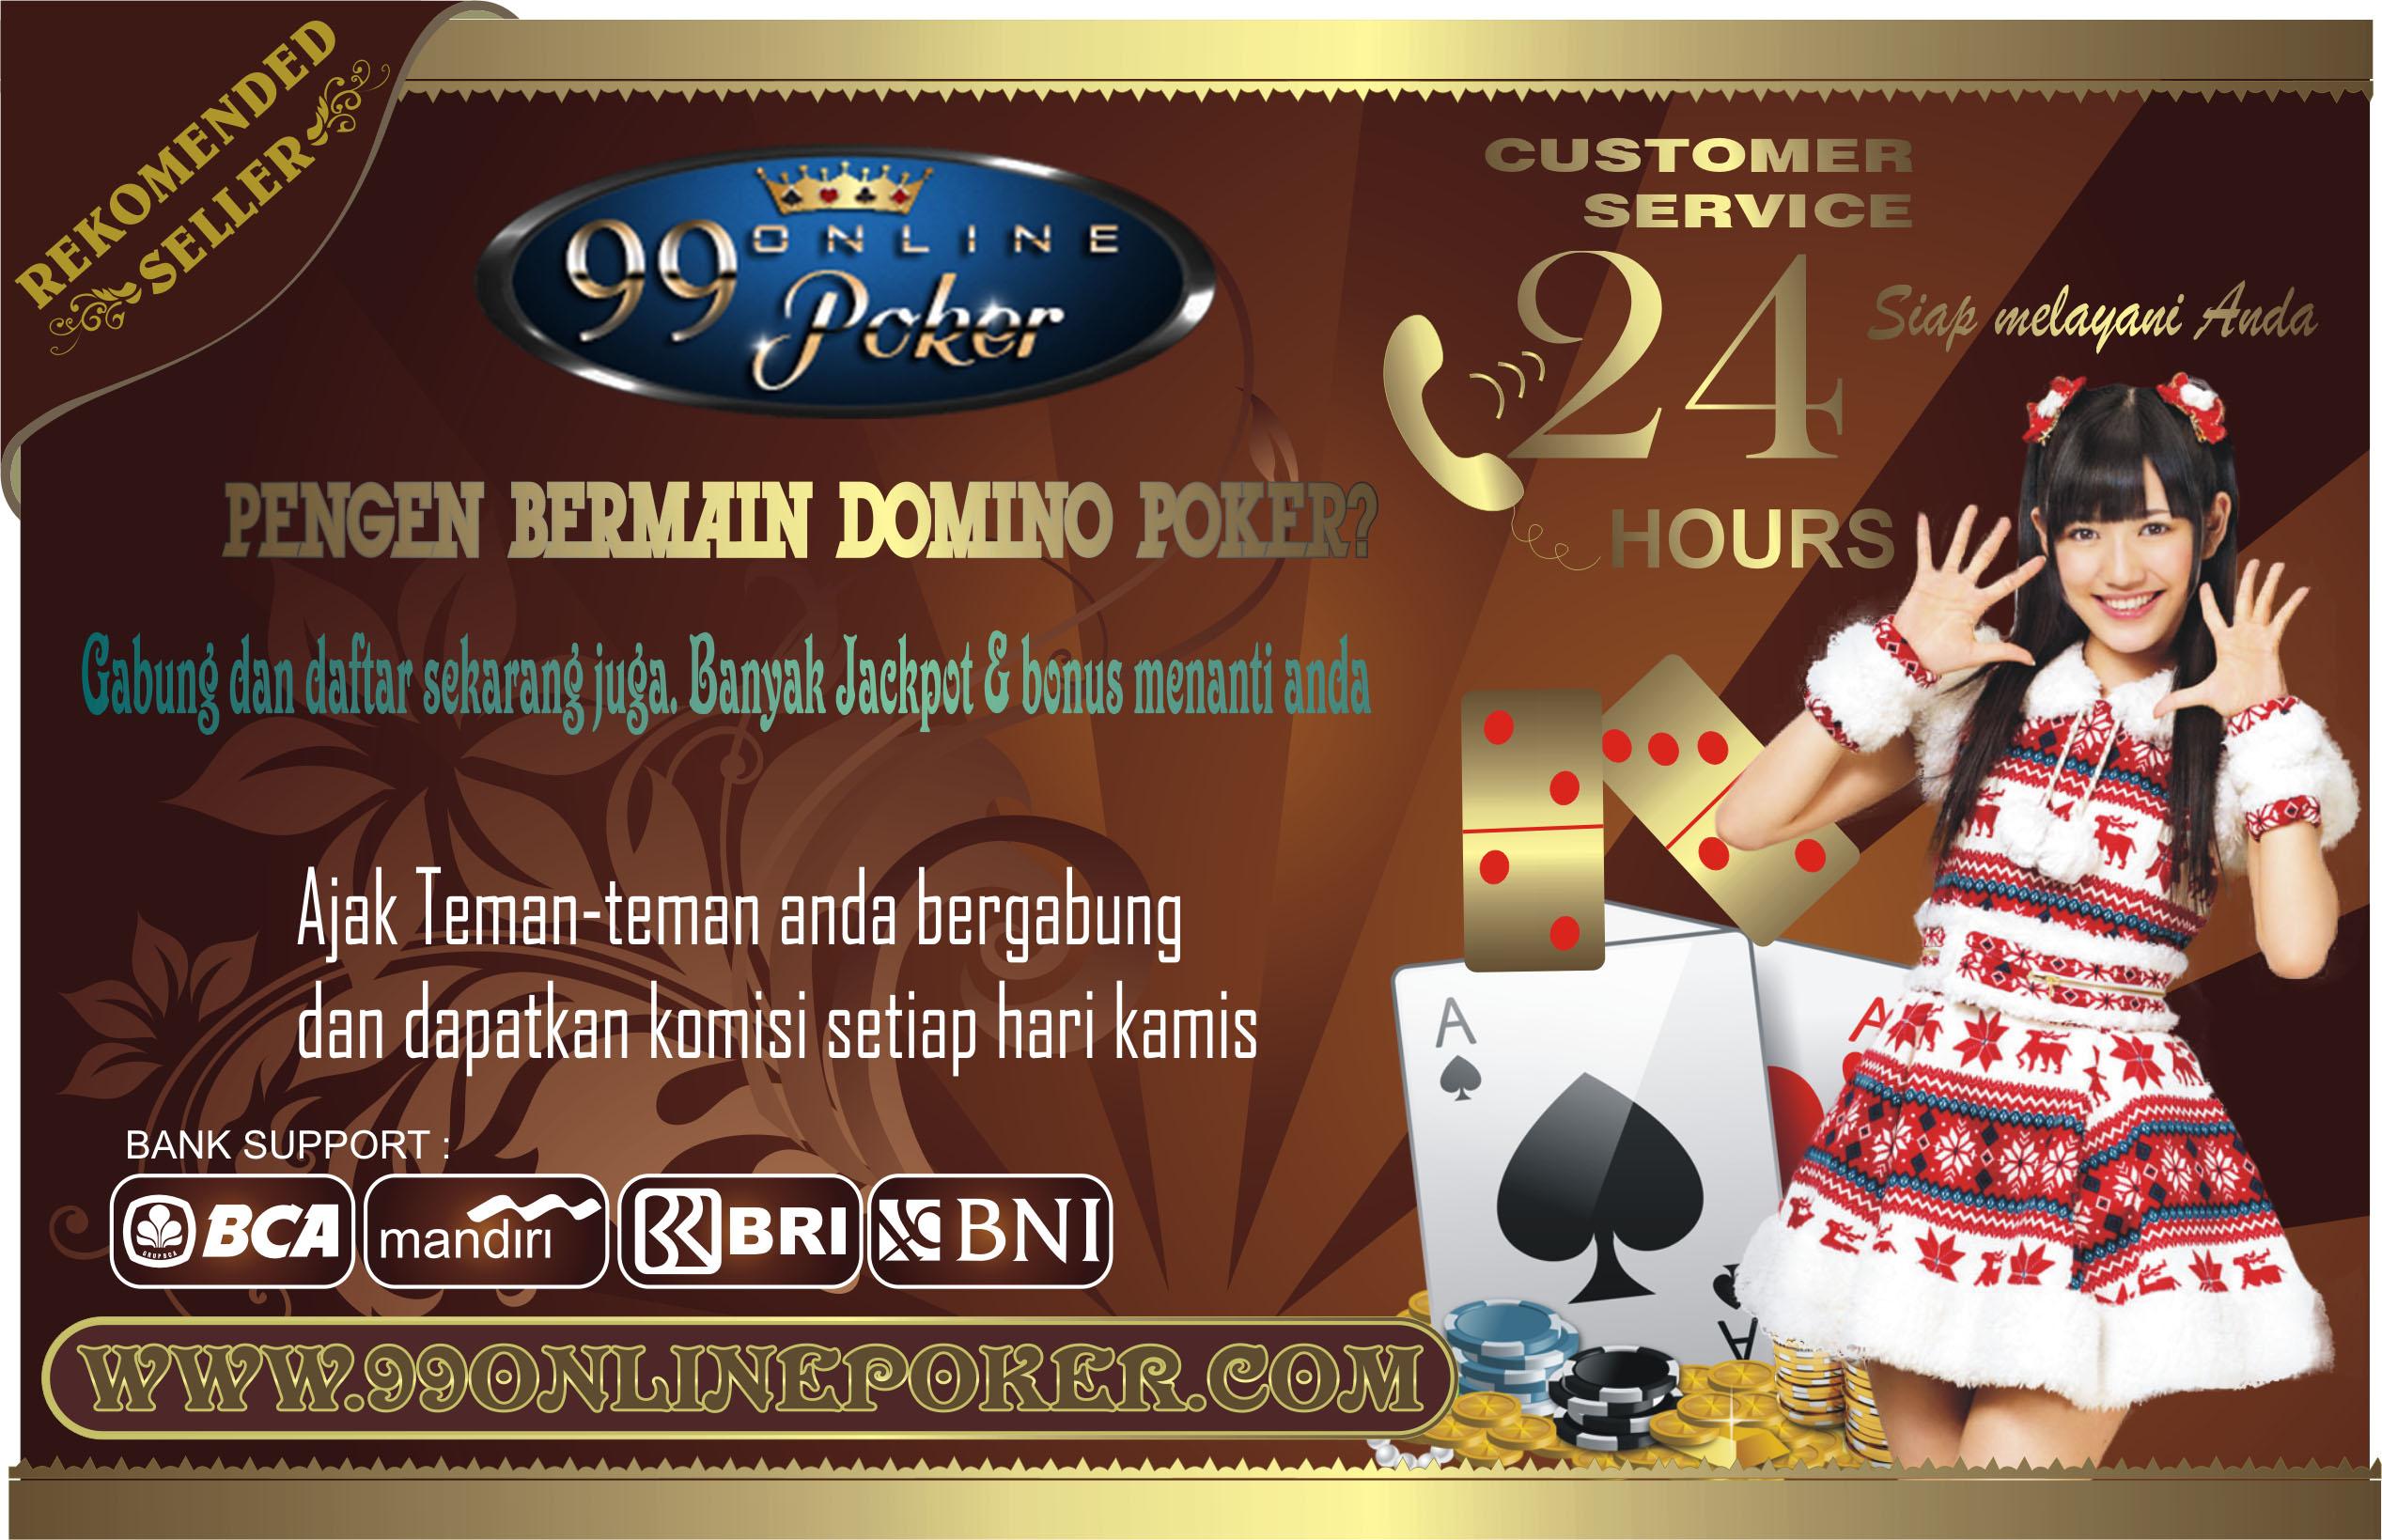 Kalahkan Agen Poker Terpercaya